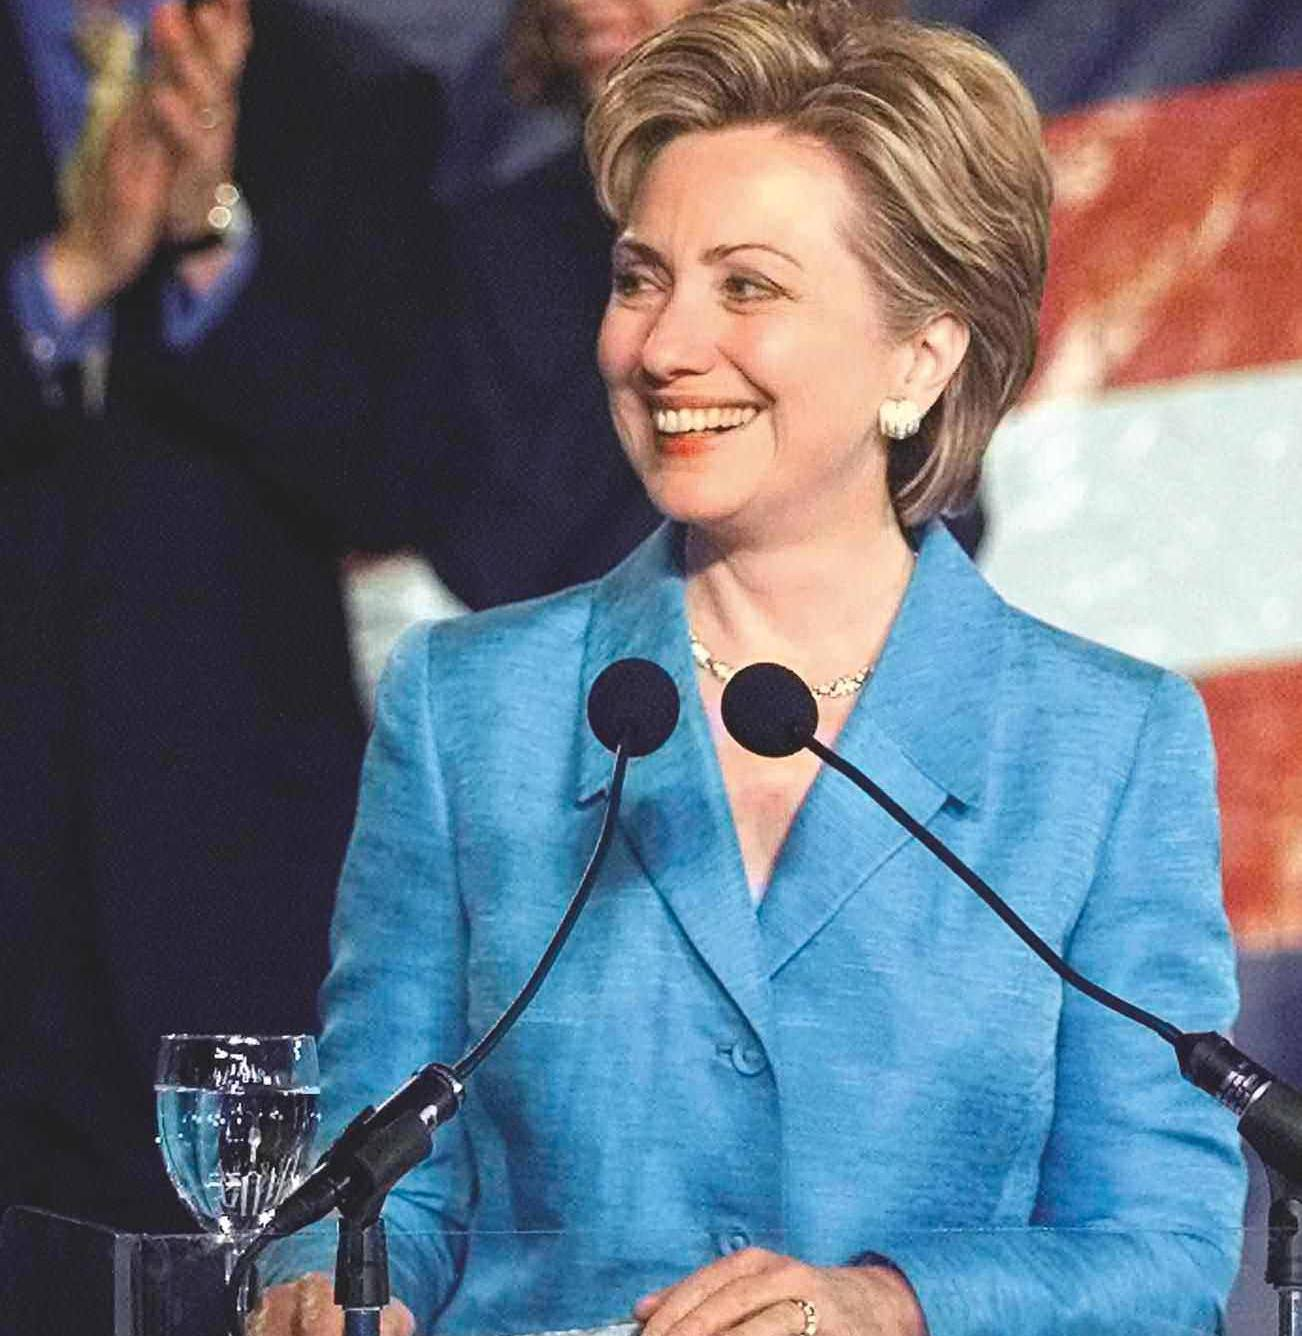 Life Stories: Hillary Clinton